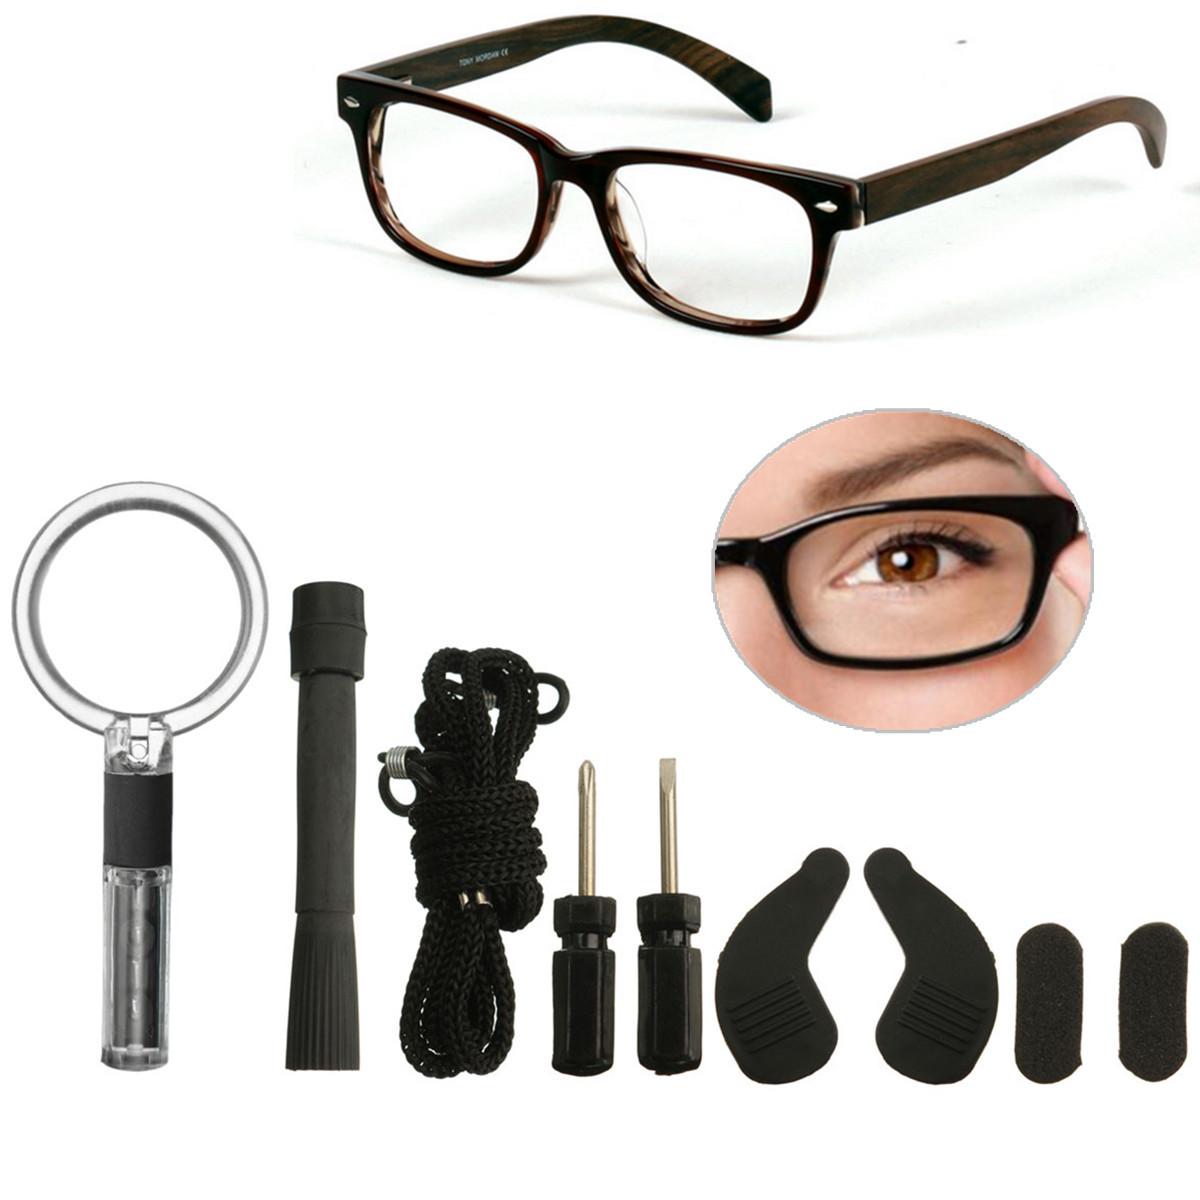 Glasses Repair Kit Australia : 7Pcs Multipurpose Glasses Spectacle Eyeglasses Sunglasses ...